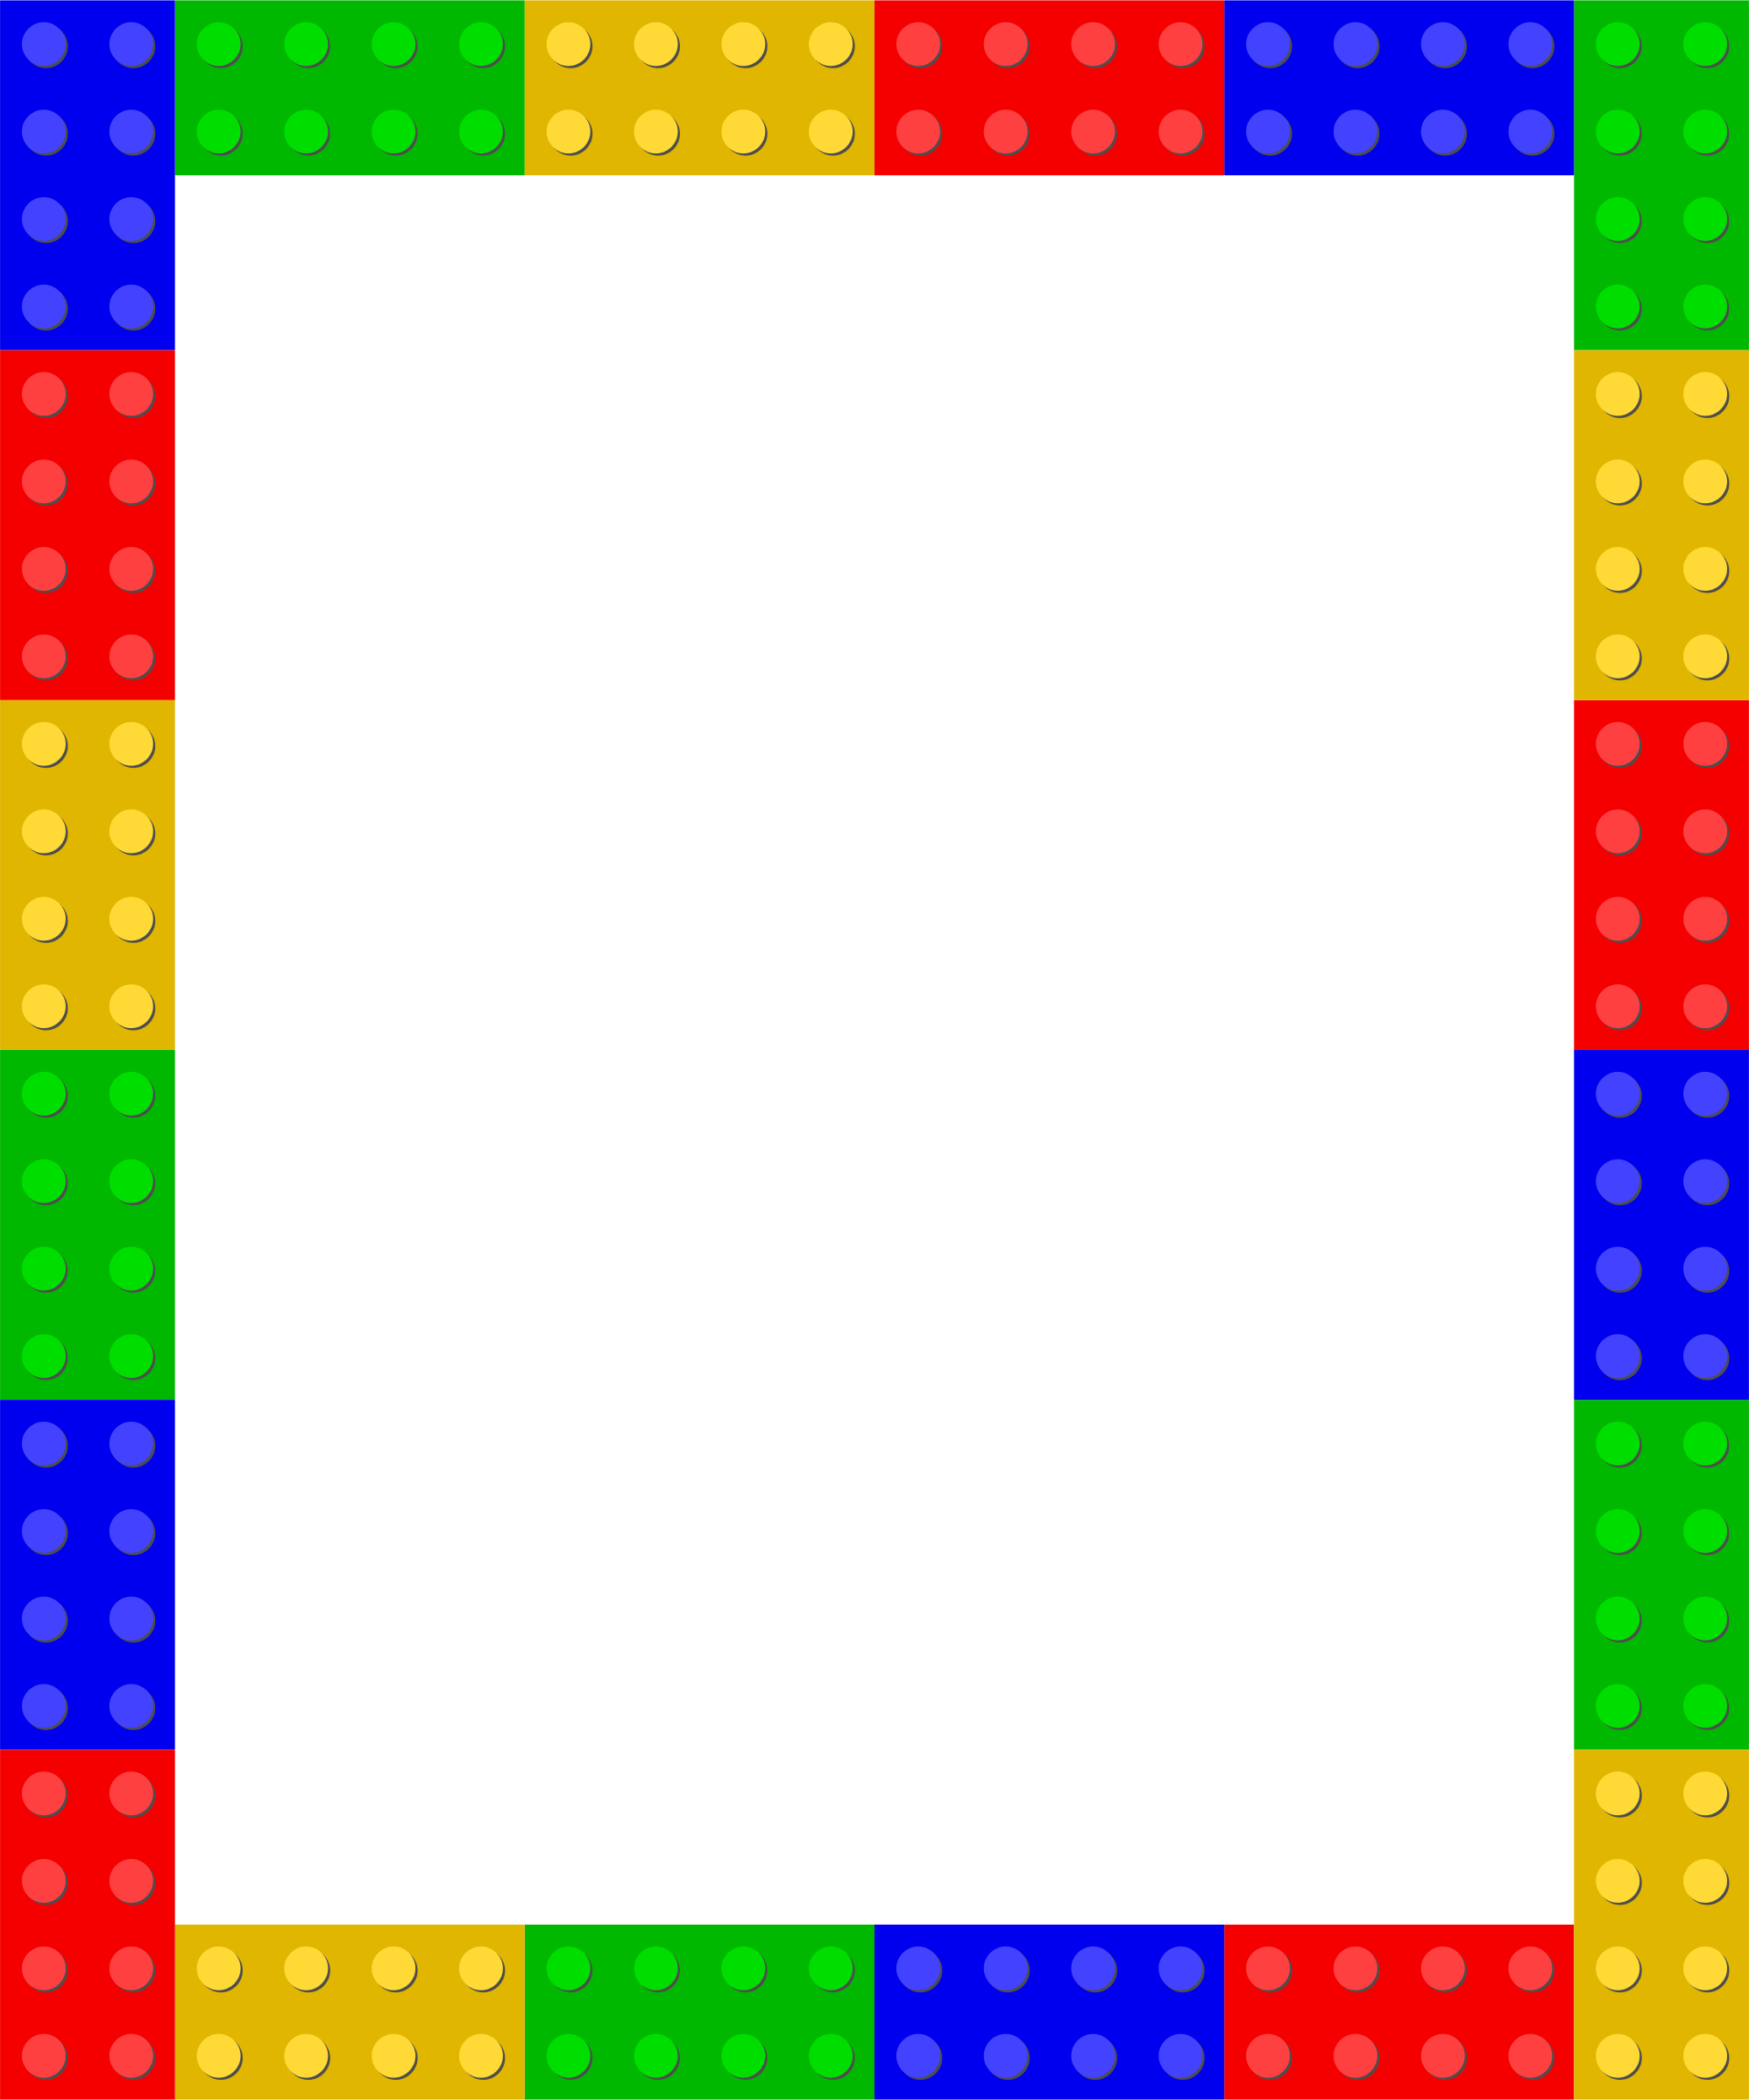 Legos clipart frame. Lego big image png